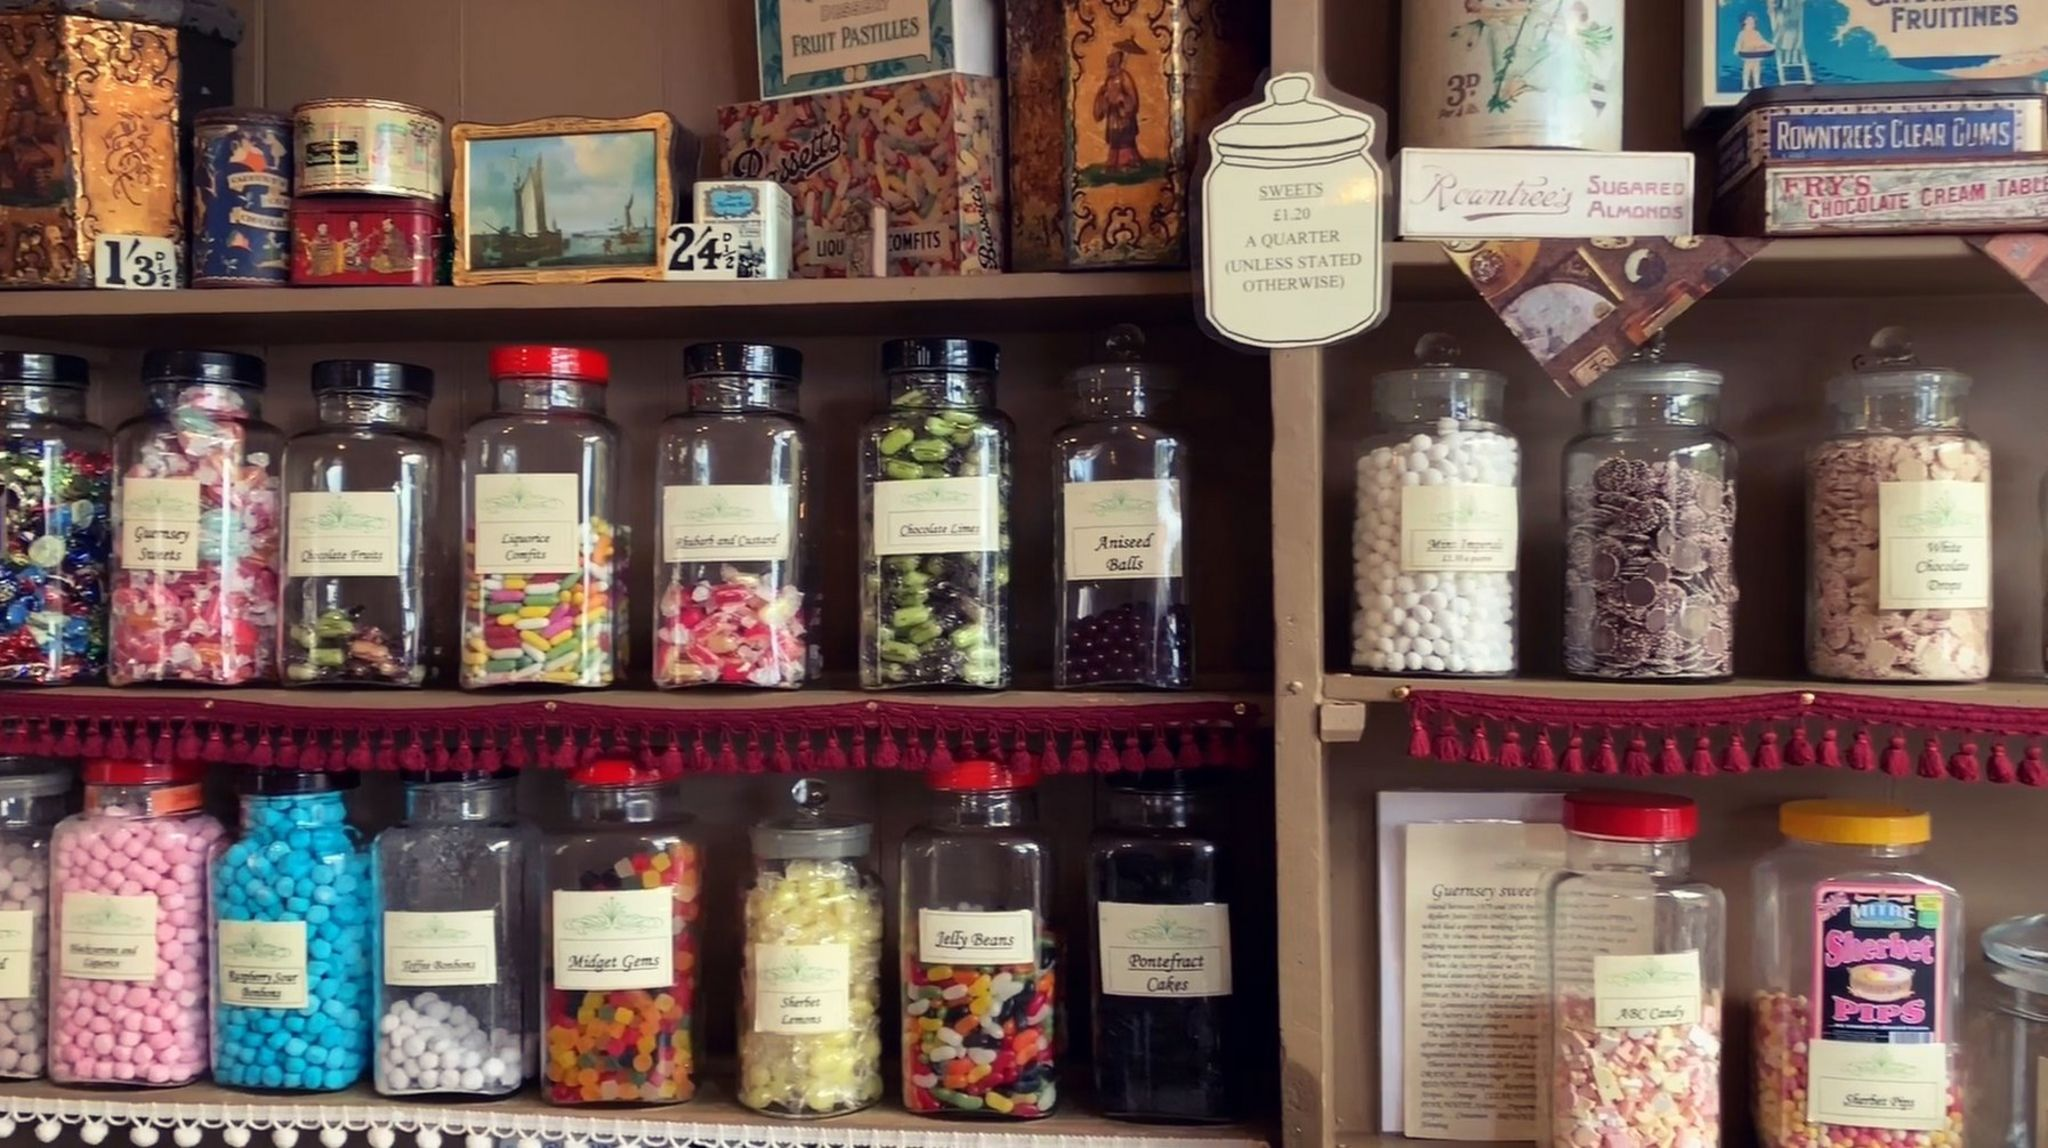 Sweets in jars on shop shelves.